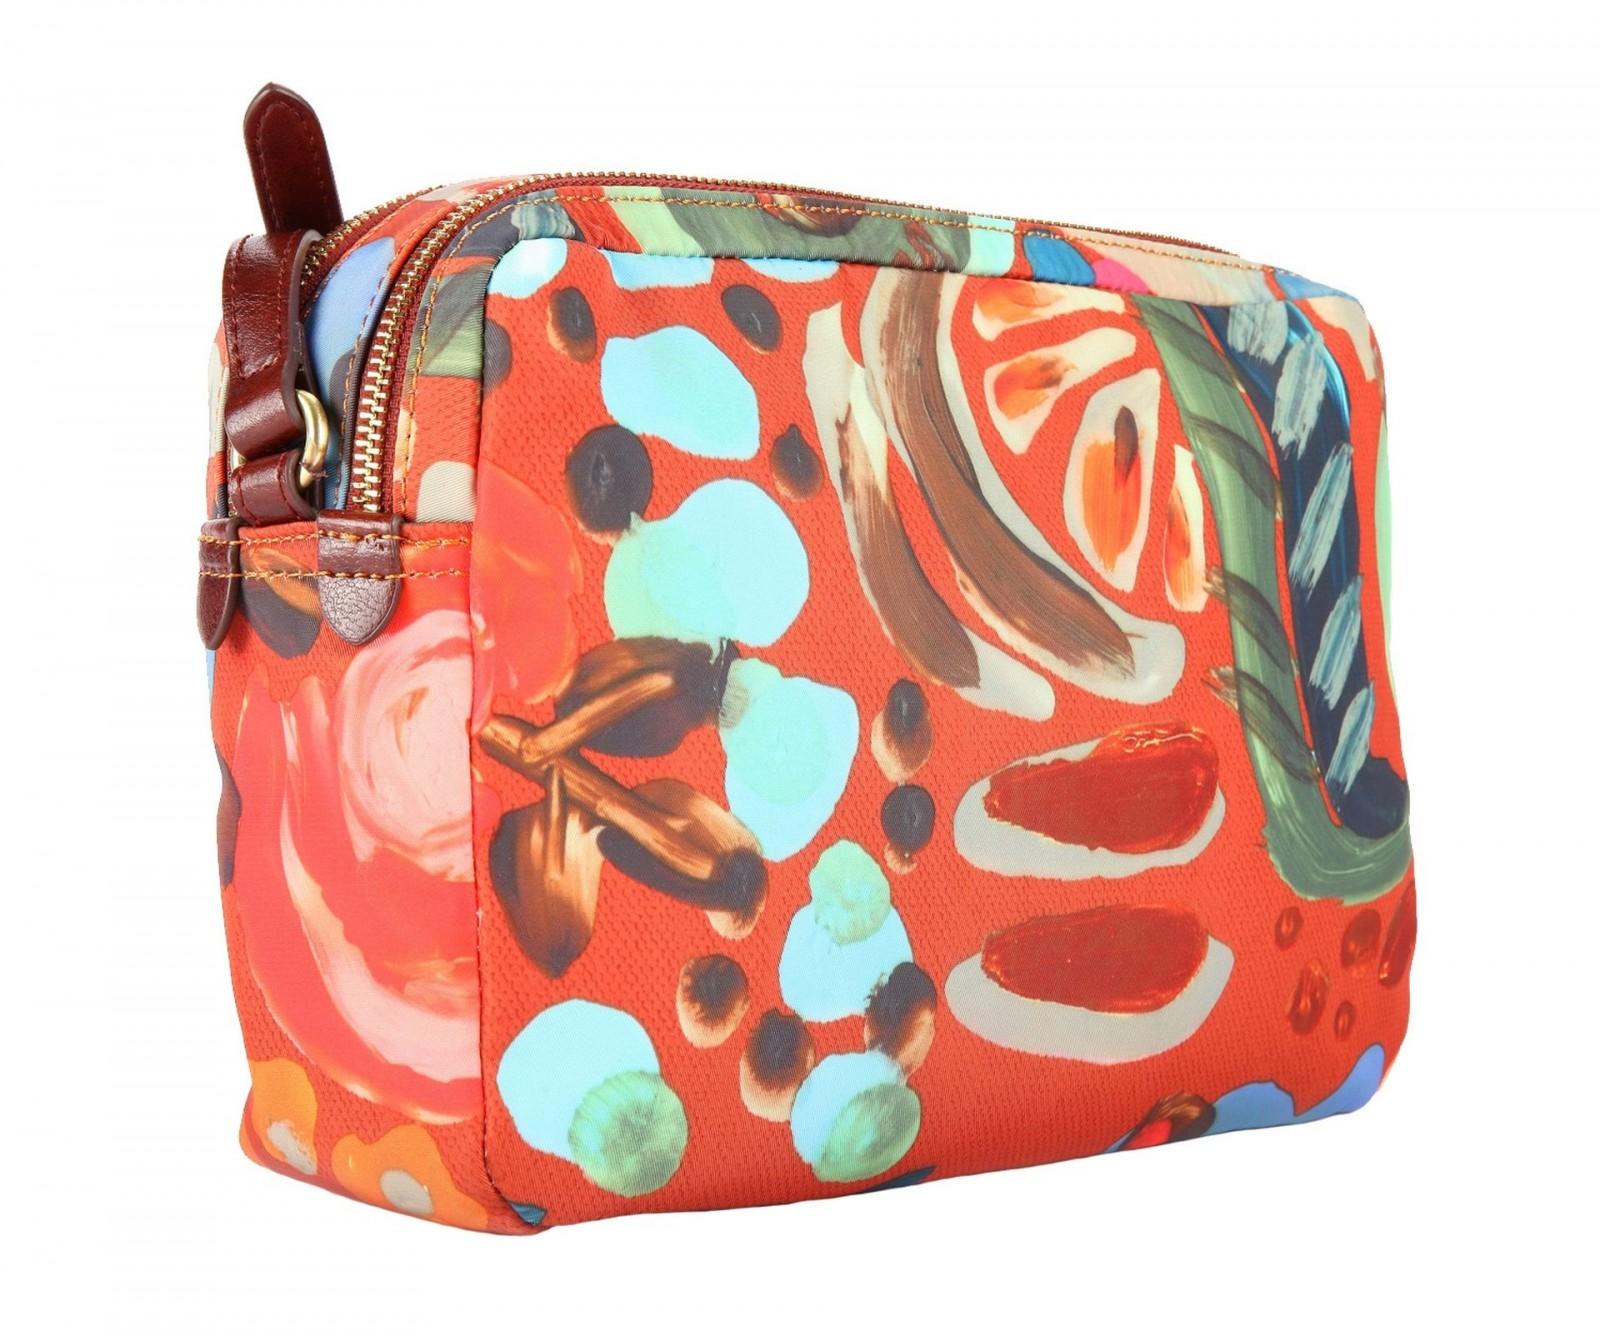 Painterly S Shoulder Bag Cinnamon Oilily r4ntHQ